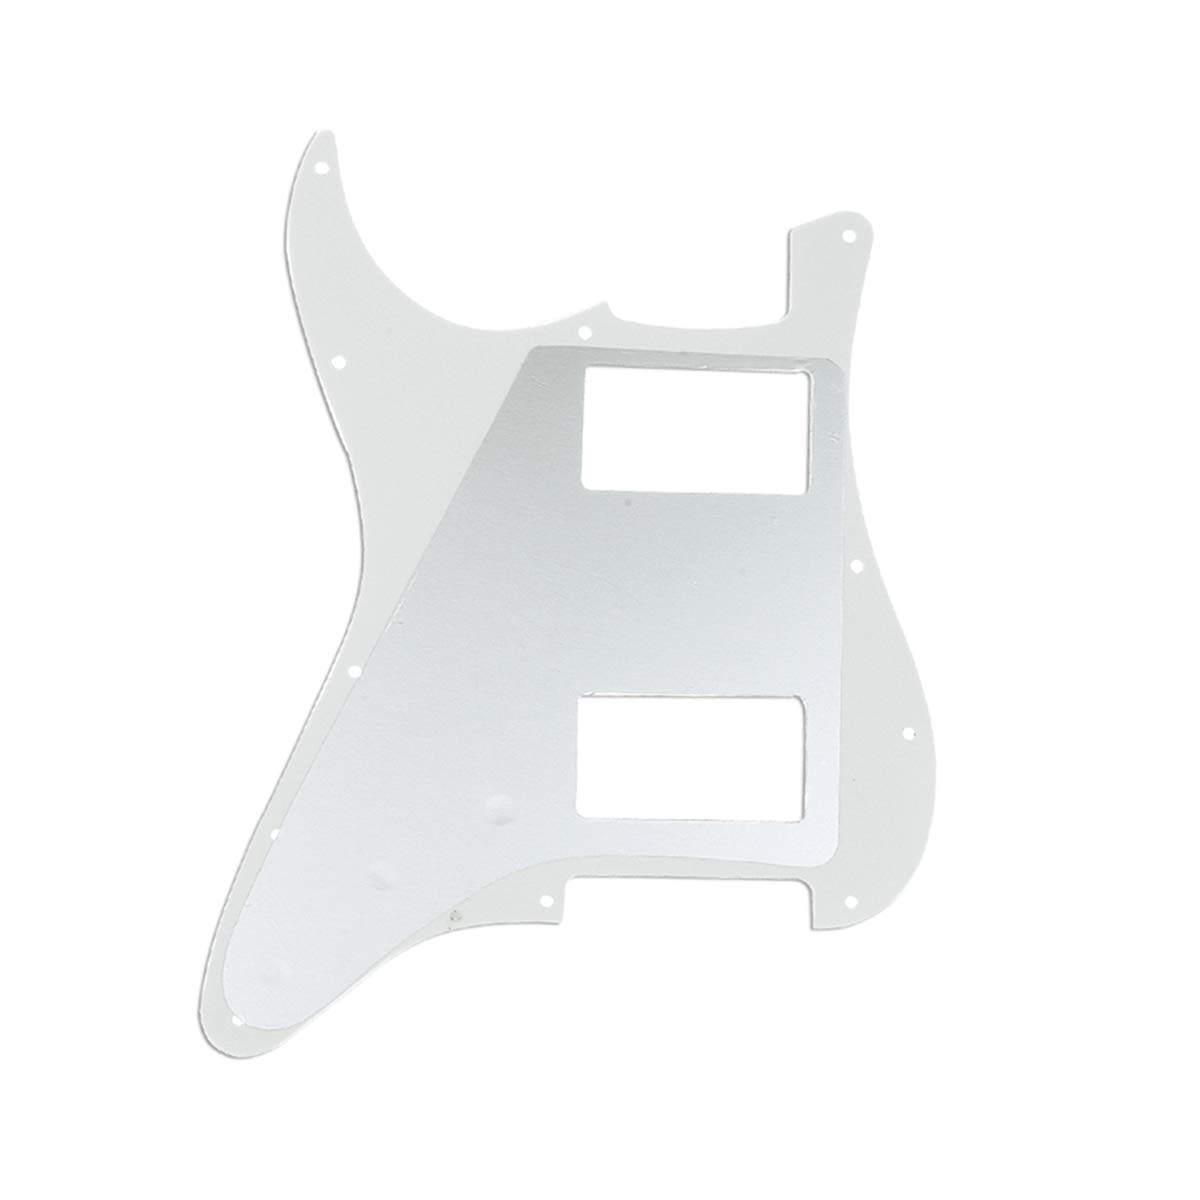 Musiclily Pro 11 Agujeros HH Strat Pickguard Humbucker Golpeador para Guitarra Fender American//M/éxico Standard Stratocaster Estilo Moderno 3 capas Marfil